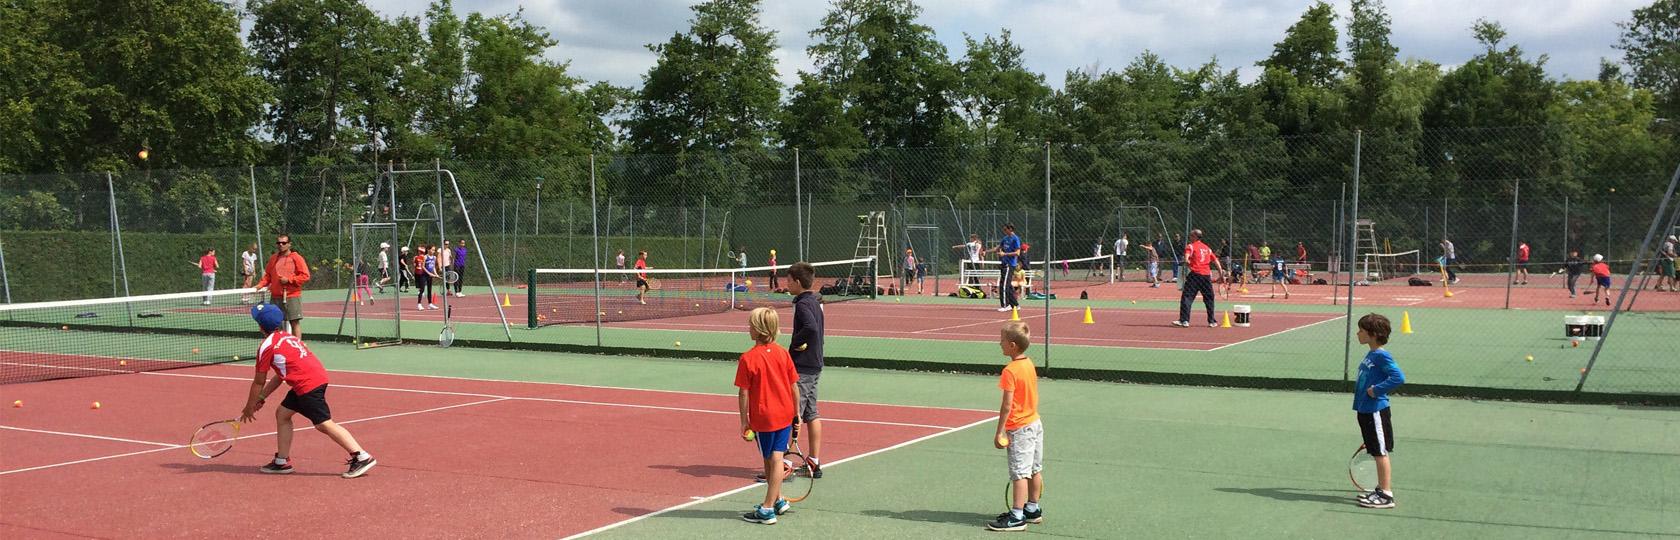 tennis_en_fete.jpg